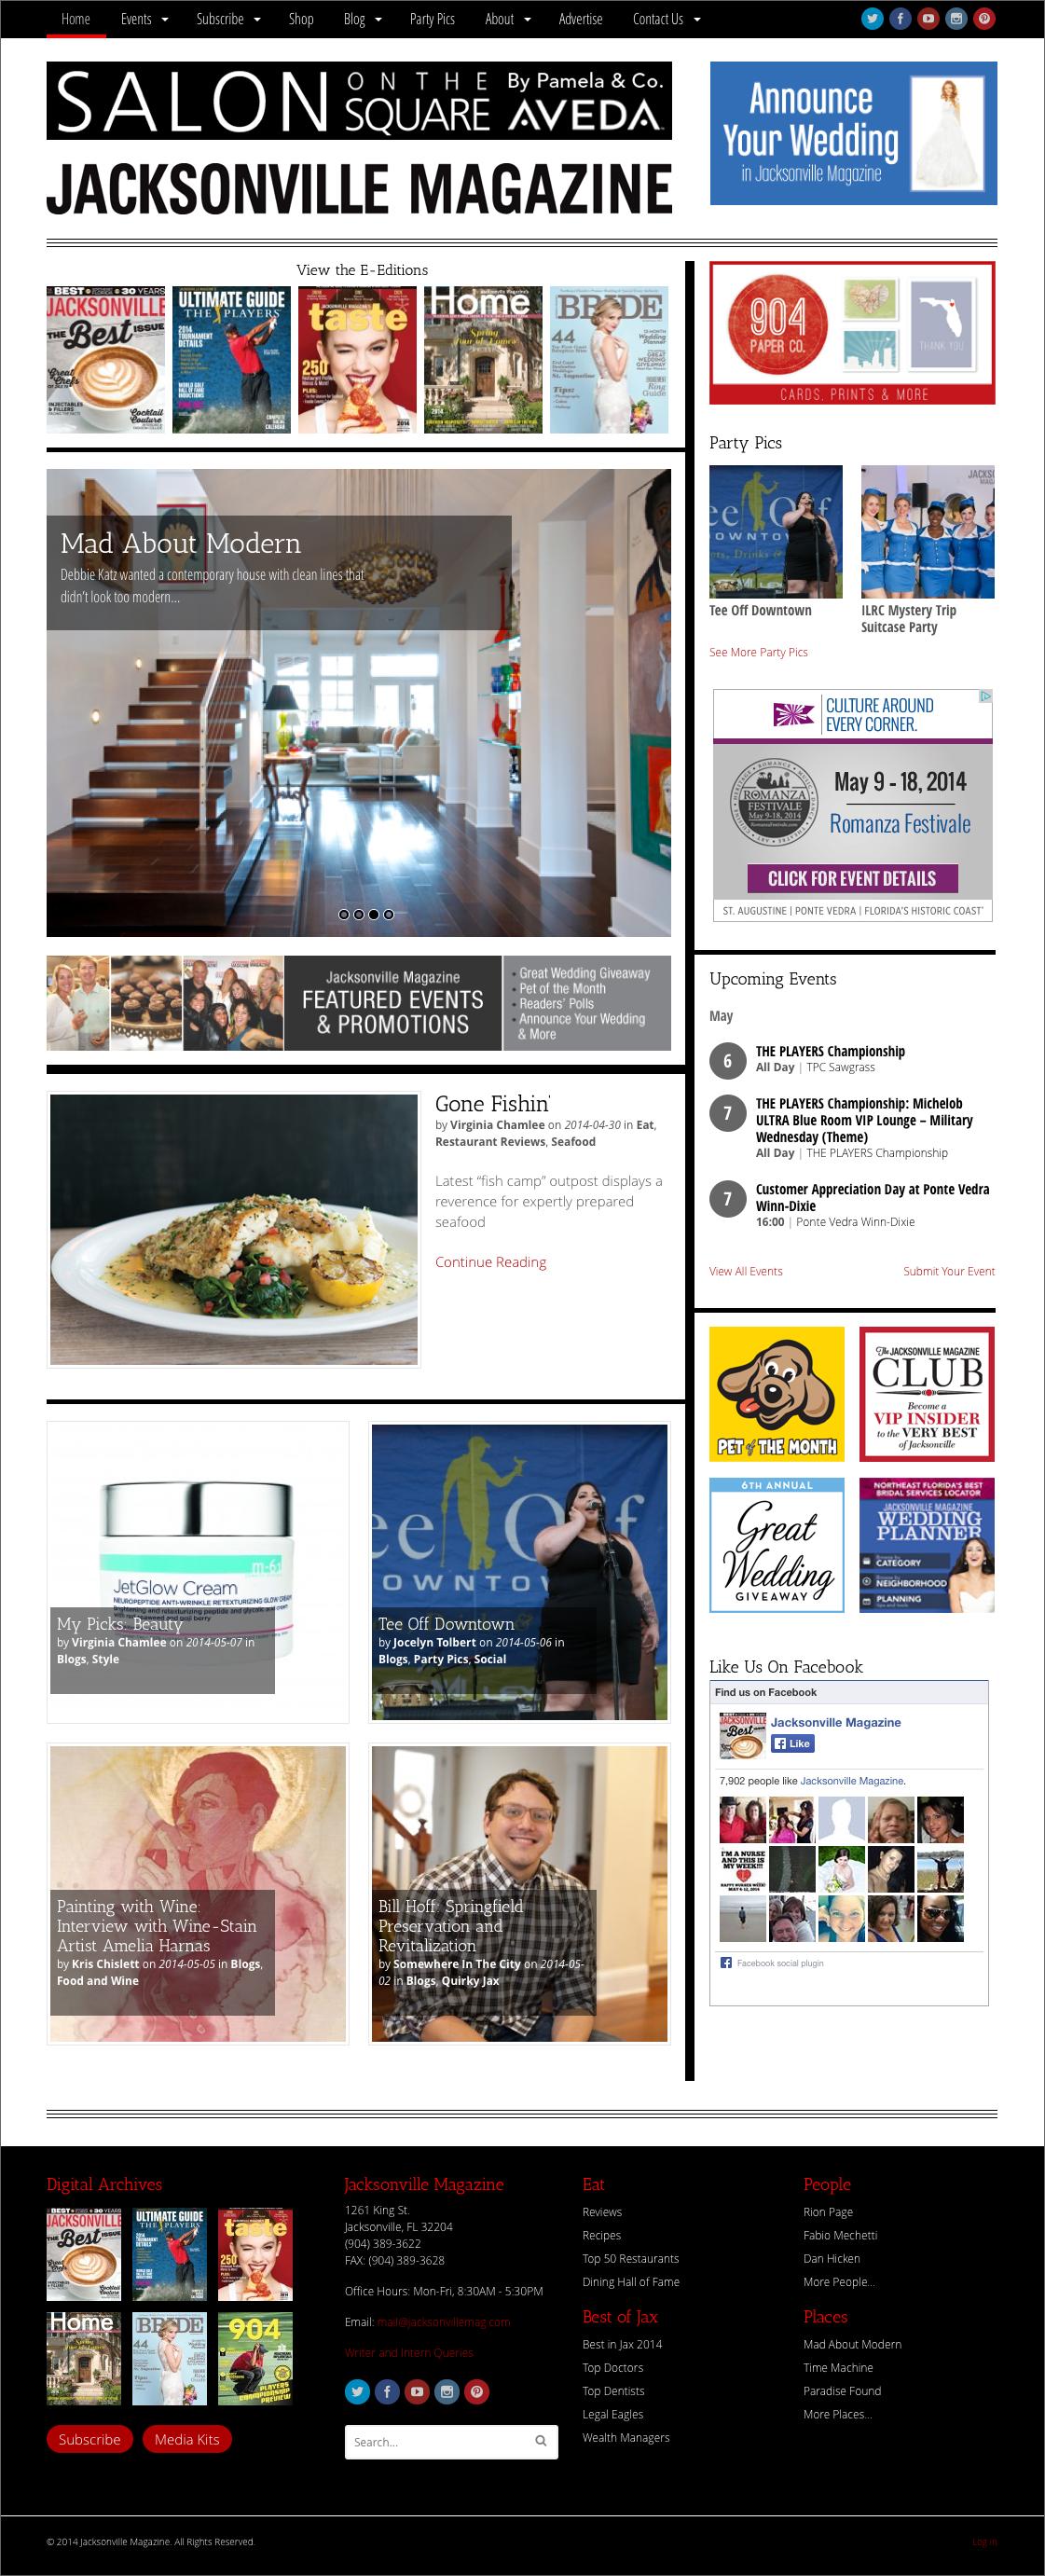 Jacksonville Magazine website - screenshot of homepage